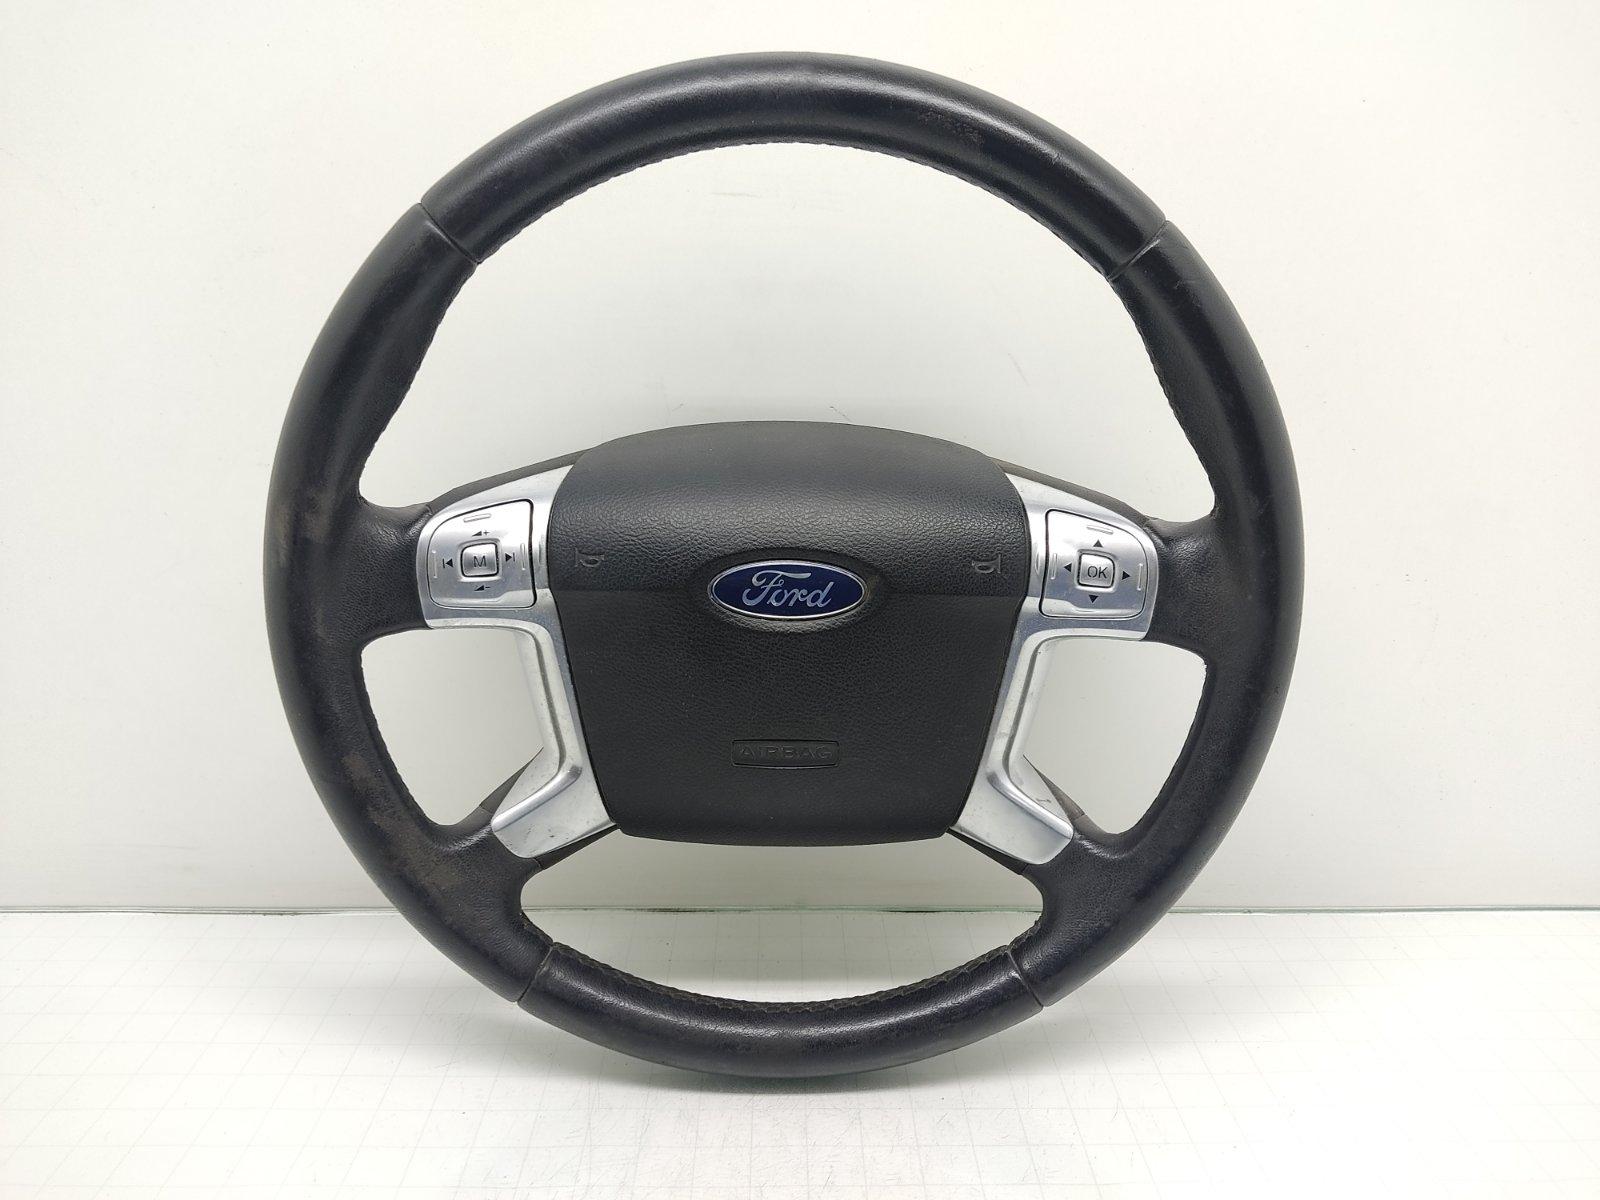 Руль Ford Galaxy 1.8 TDCI 2007 (б/у)